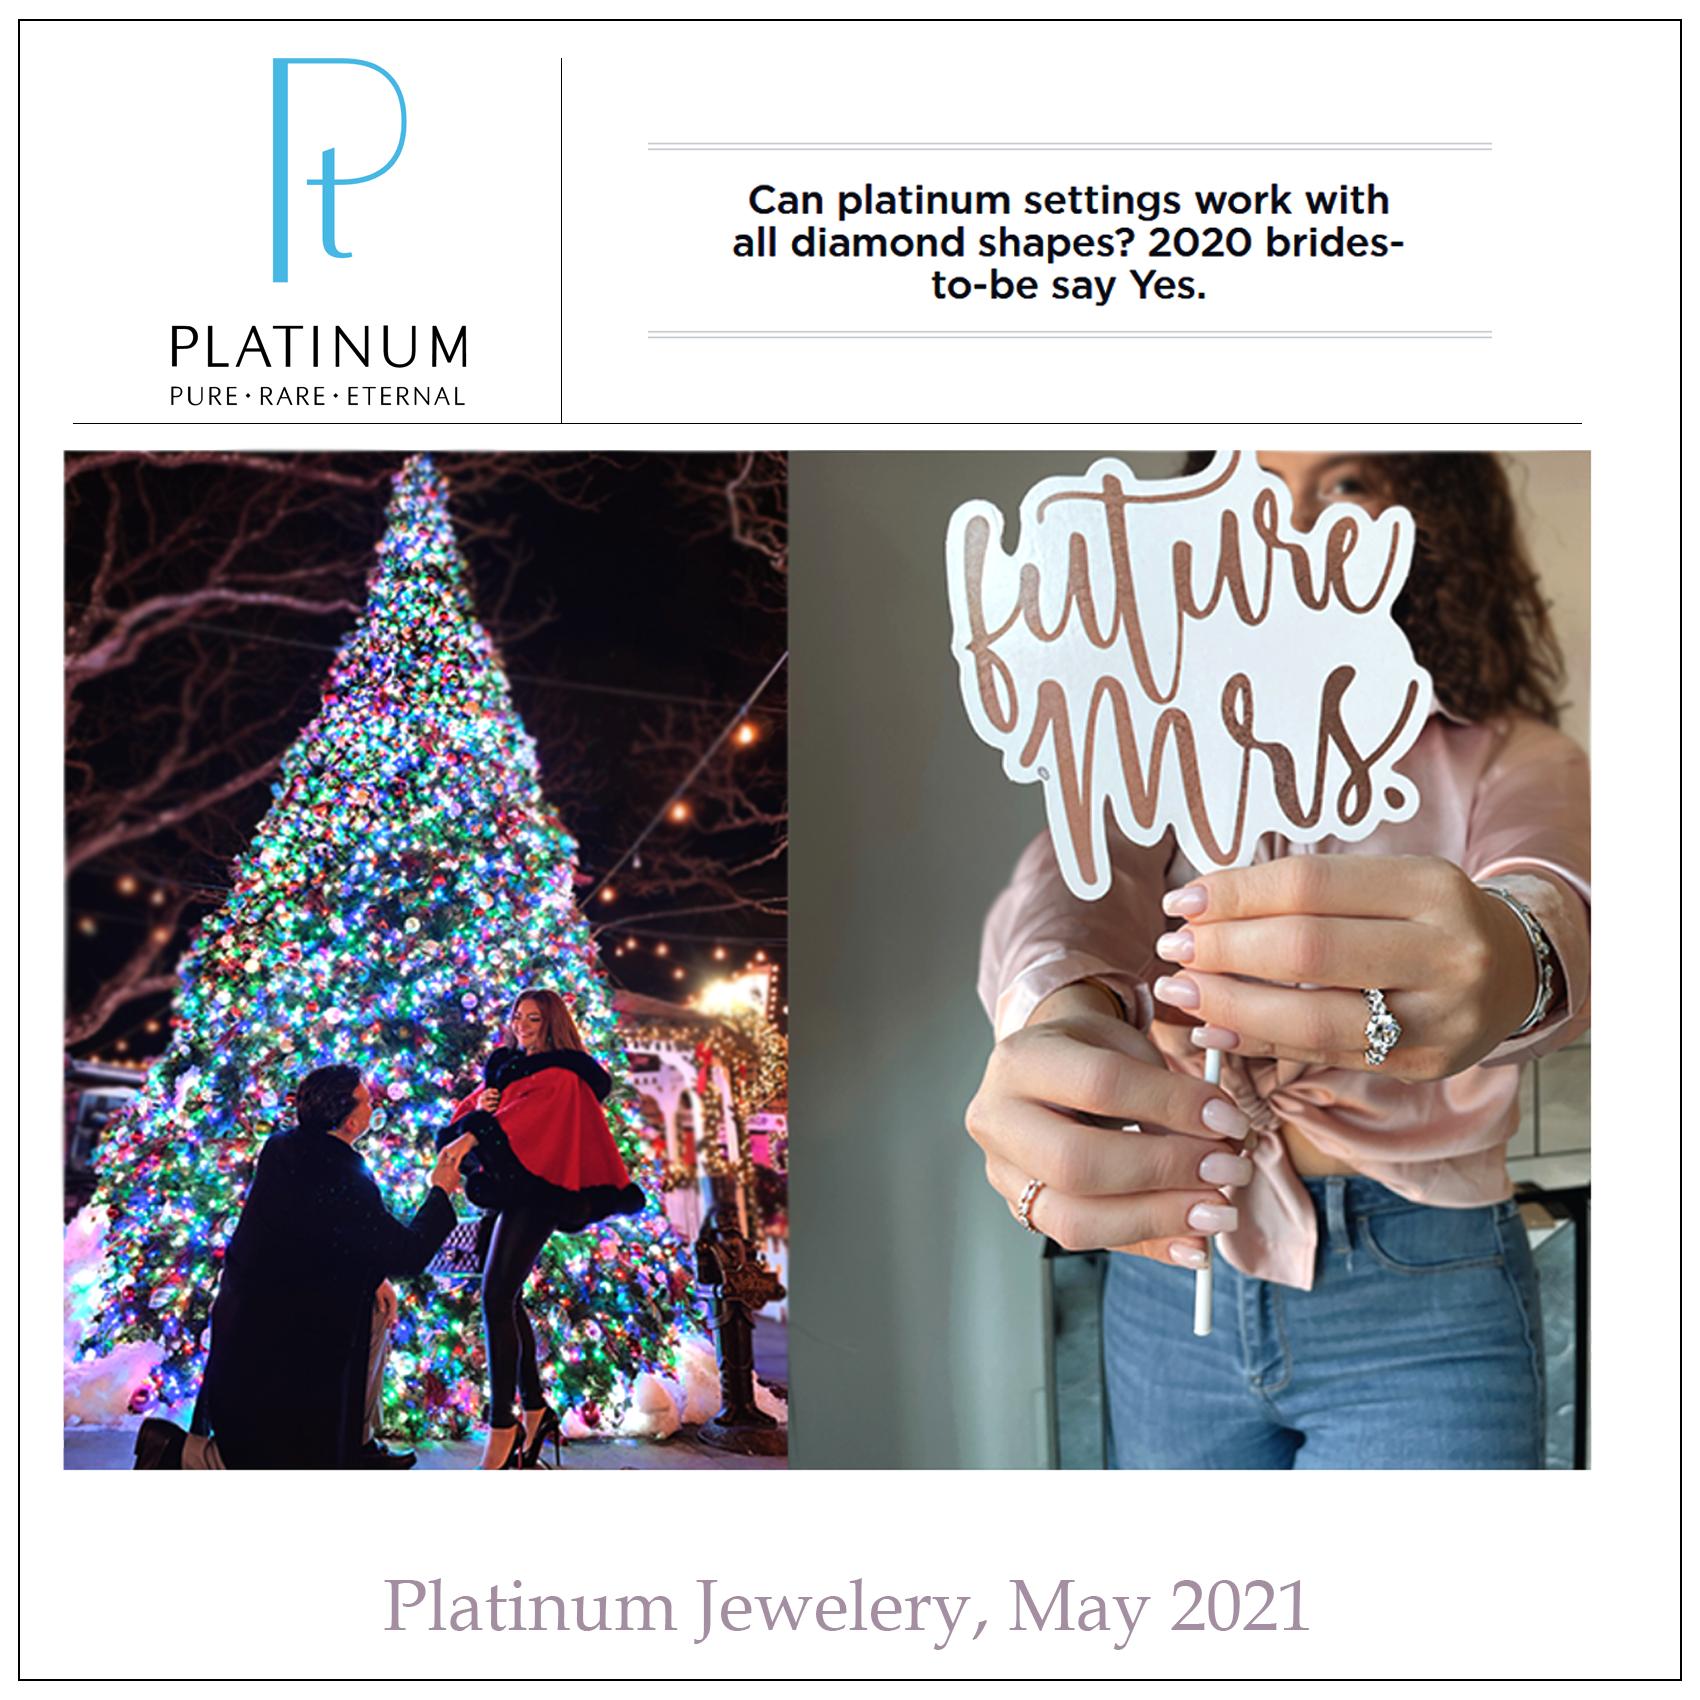 platinum-jewelery-may-2021.png